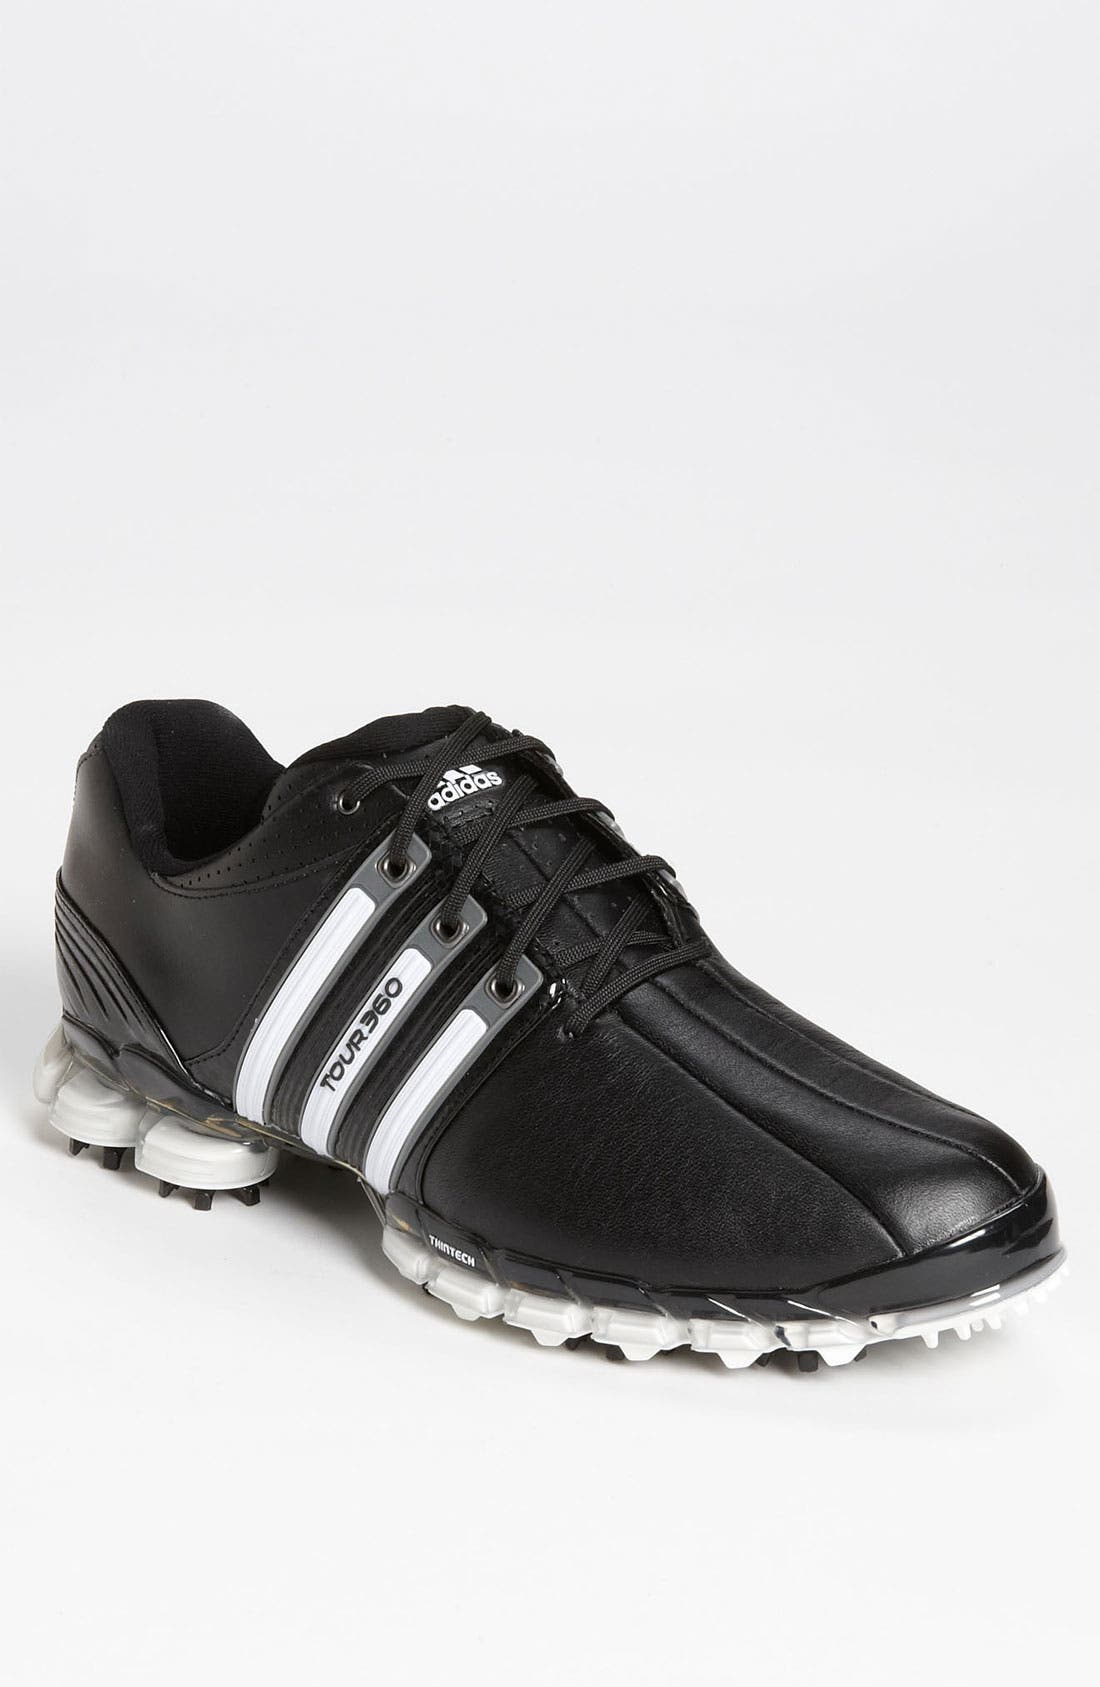 Main Image - adidas TaylorMade 'Tour360 ATV' Golf Shoe (Men) (Online Only)